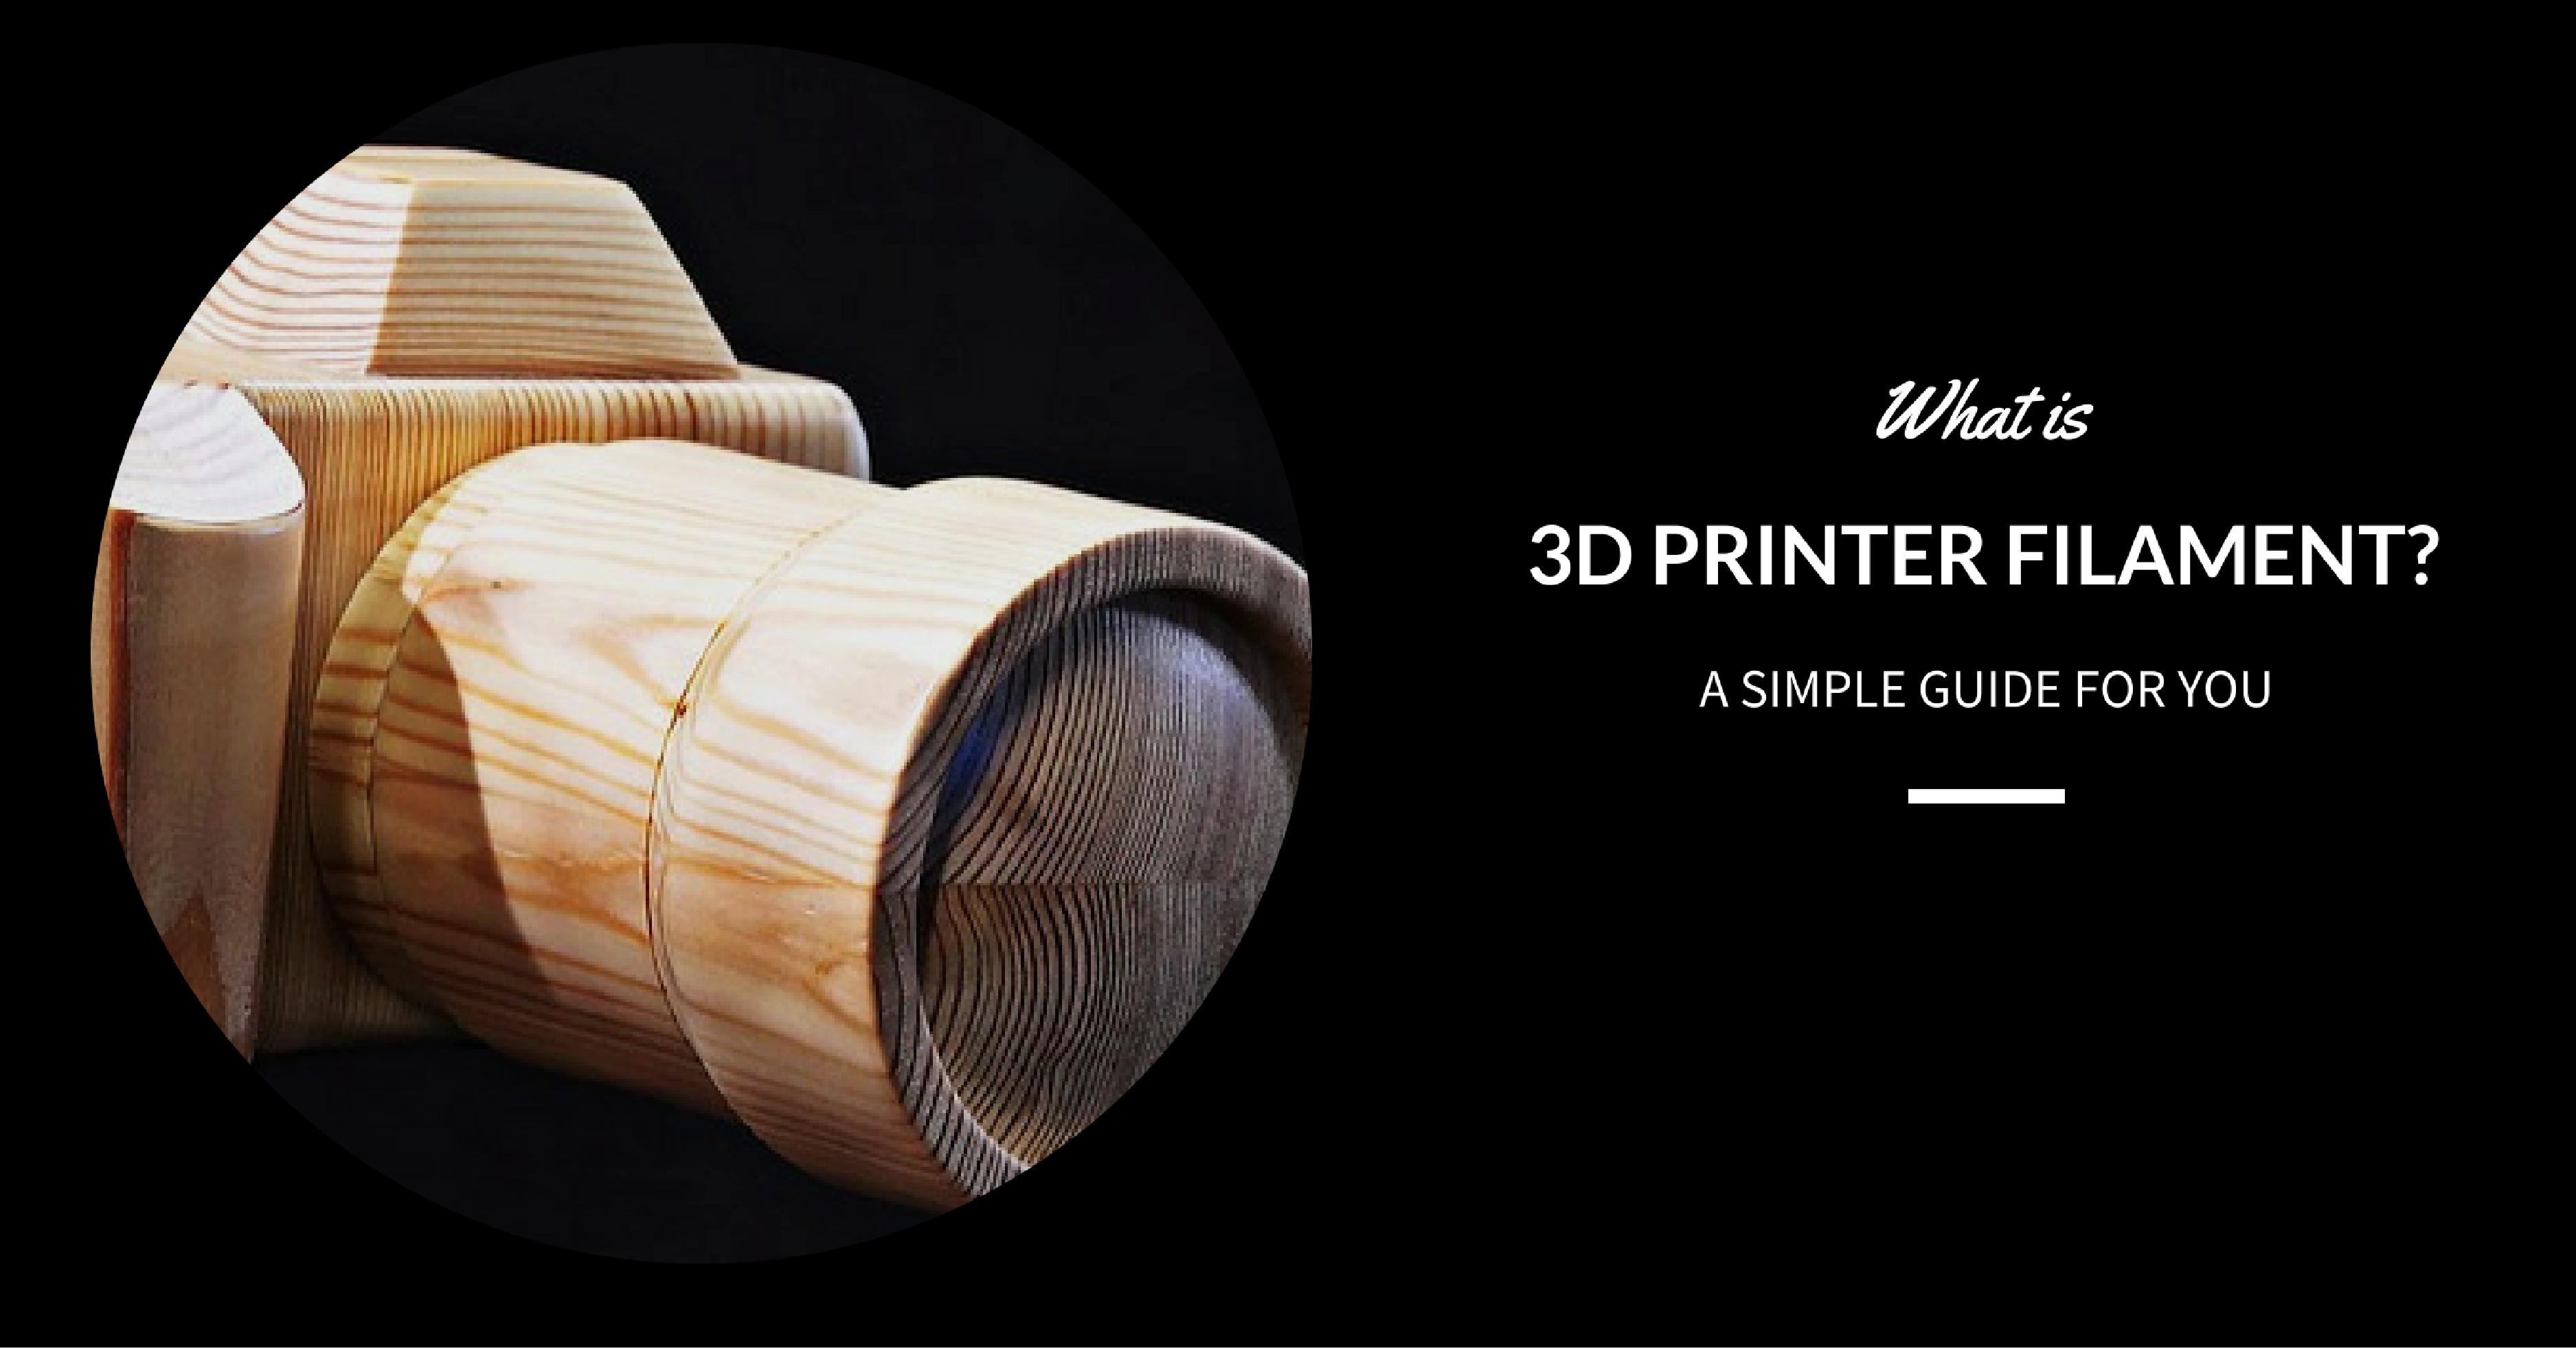 3d printer filament guide